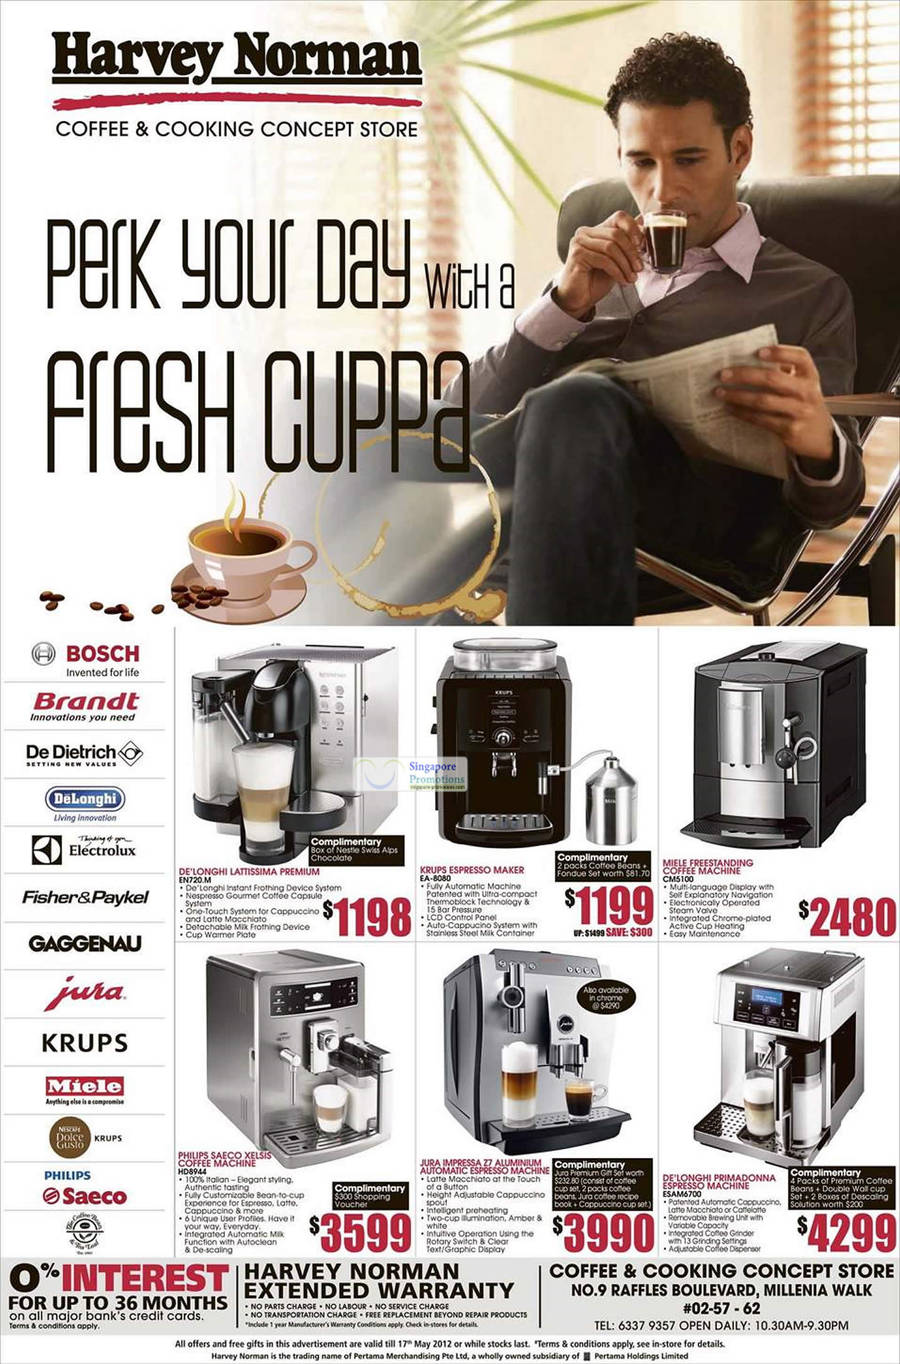 DE LONGHI LATTISSIMA PREMIUM EN720M, KRUPS ESPRESSO MAKER EA-8080, Philips Saeco XELSIS Coffee Machine HD8944, DELONGHI PRIMADONNA ESPRESSO MACHINE ESAM6700, MIELE FREESTANDING COFFEE MACHINE CM5100